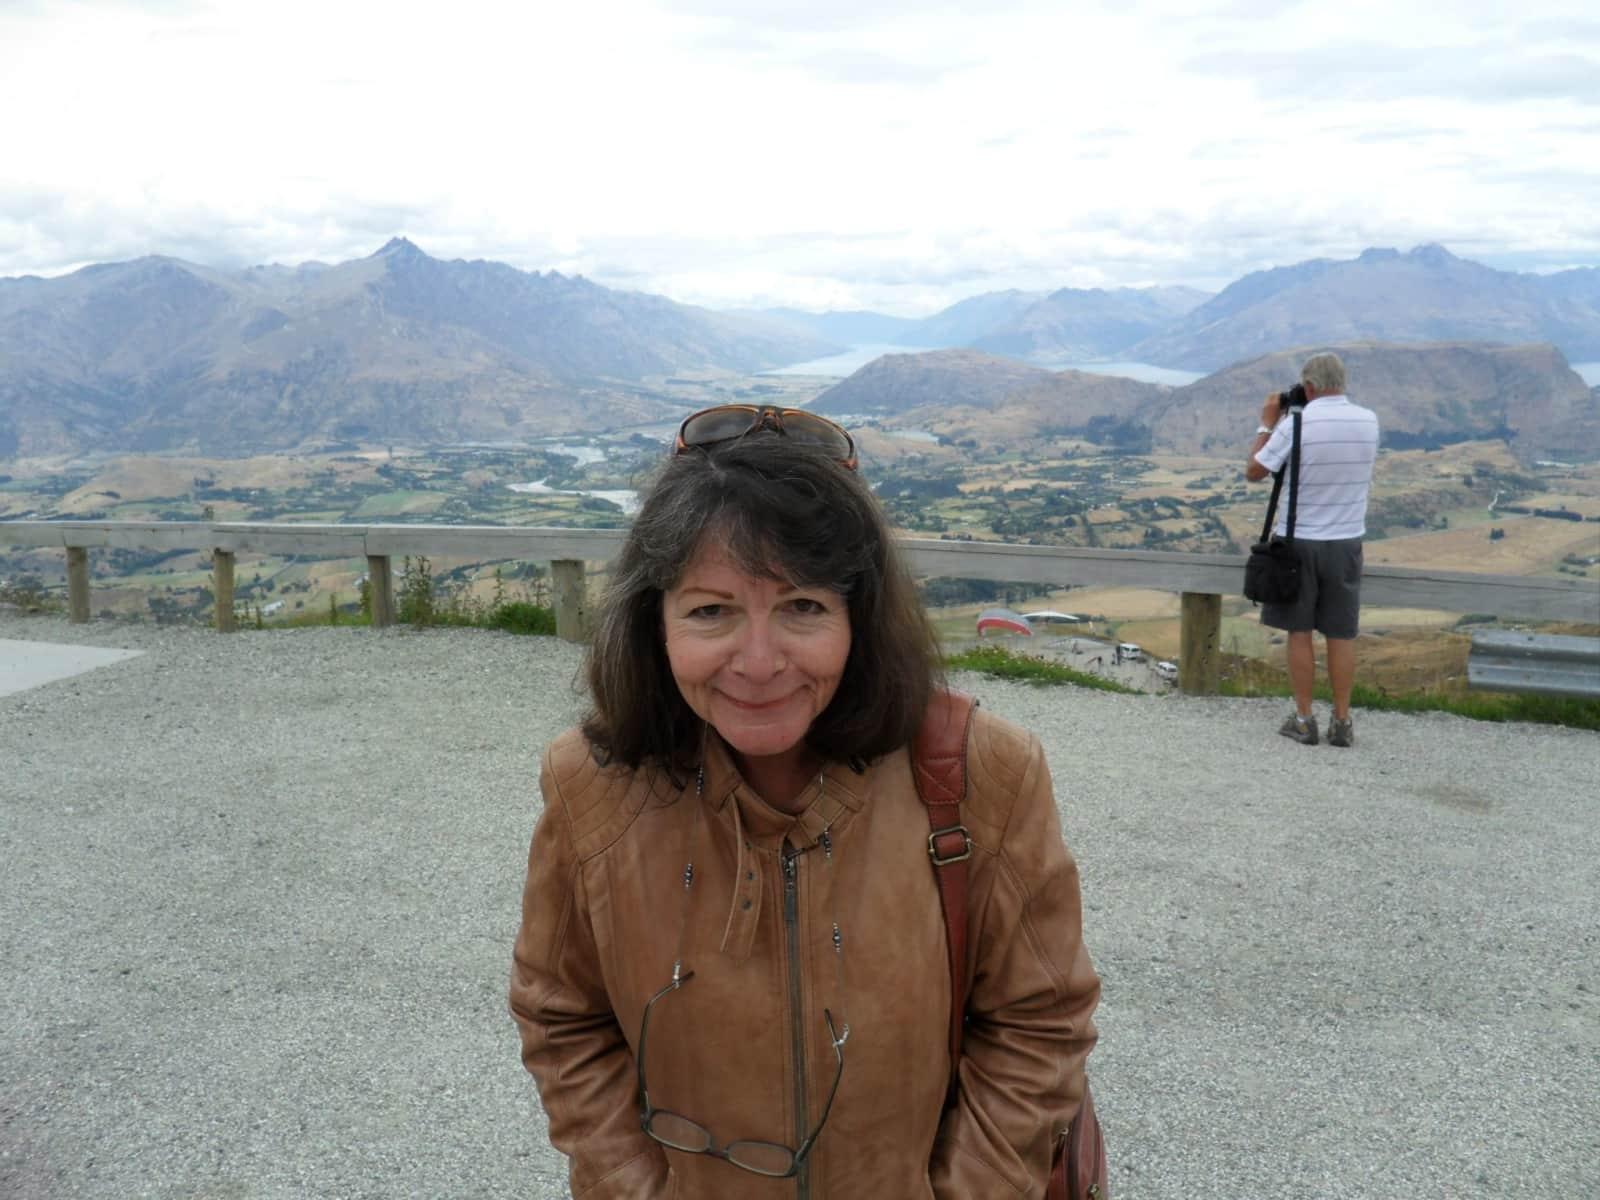 Jean from Perth, Western Australia, Australia